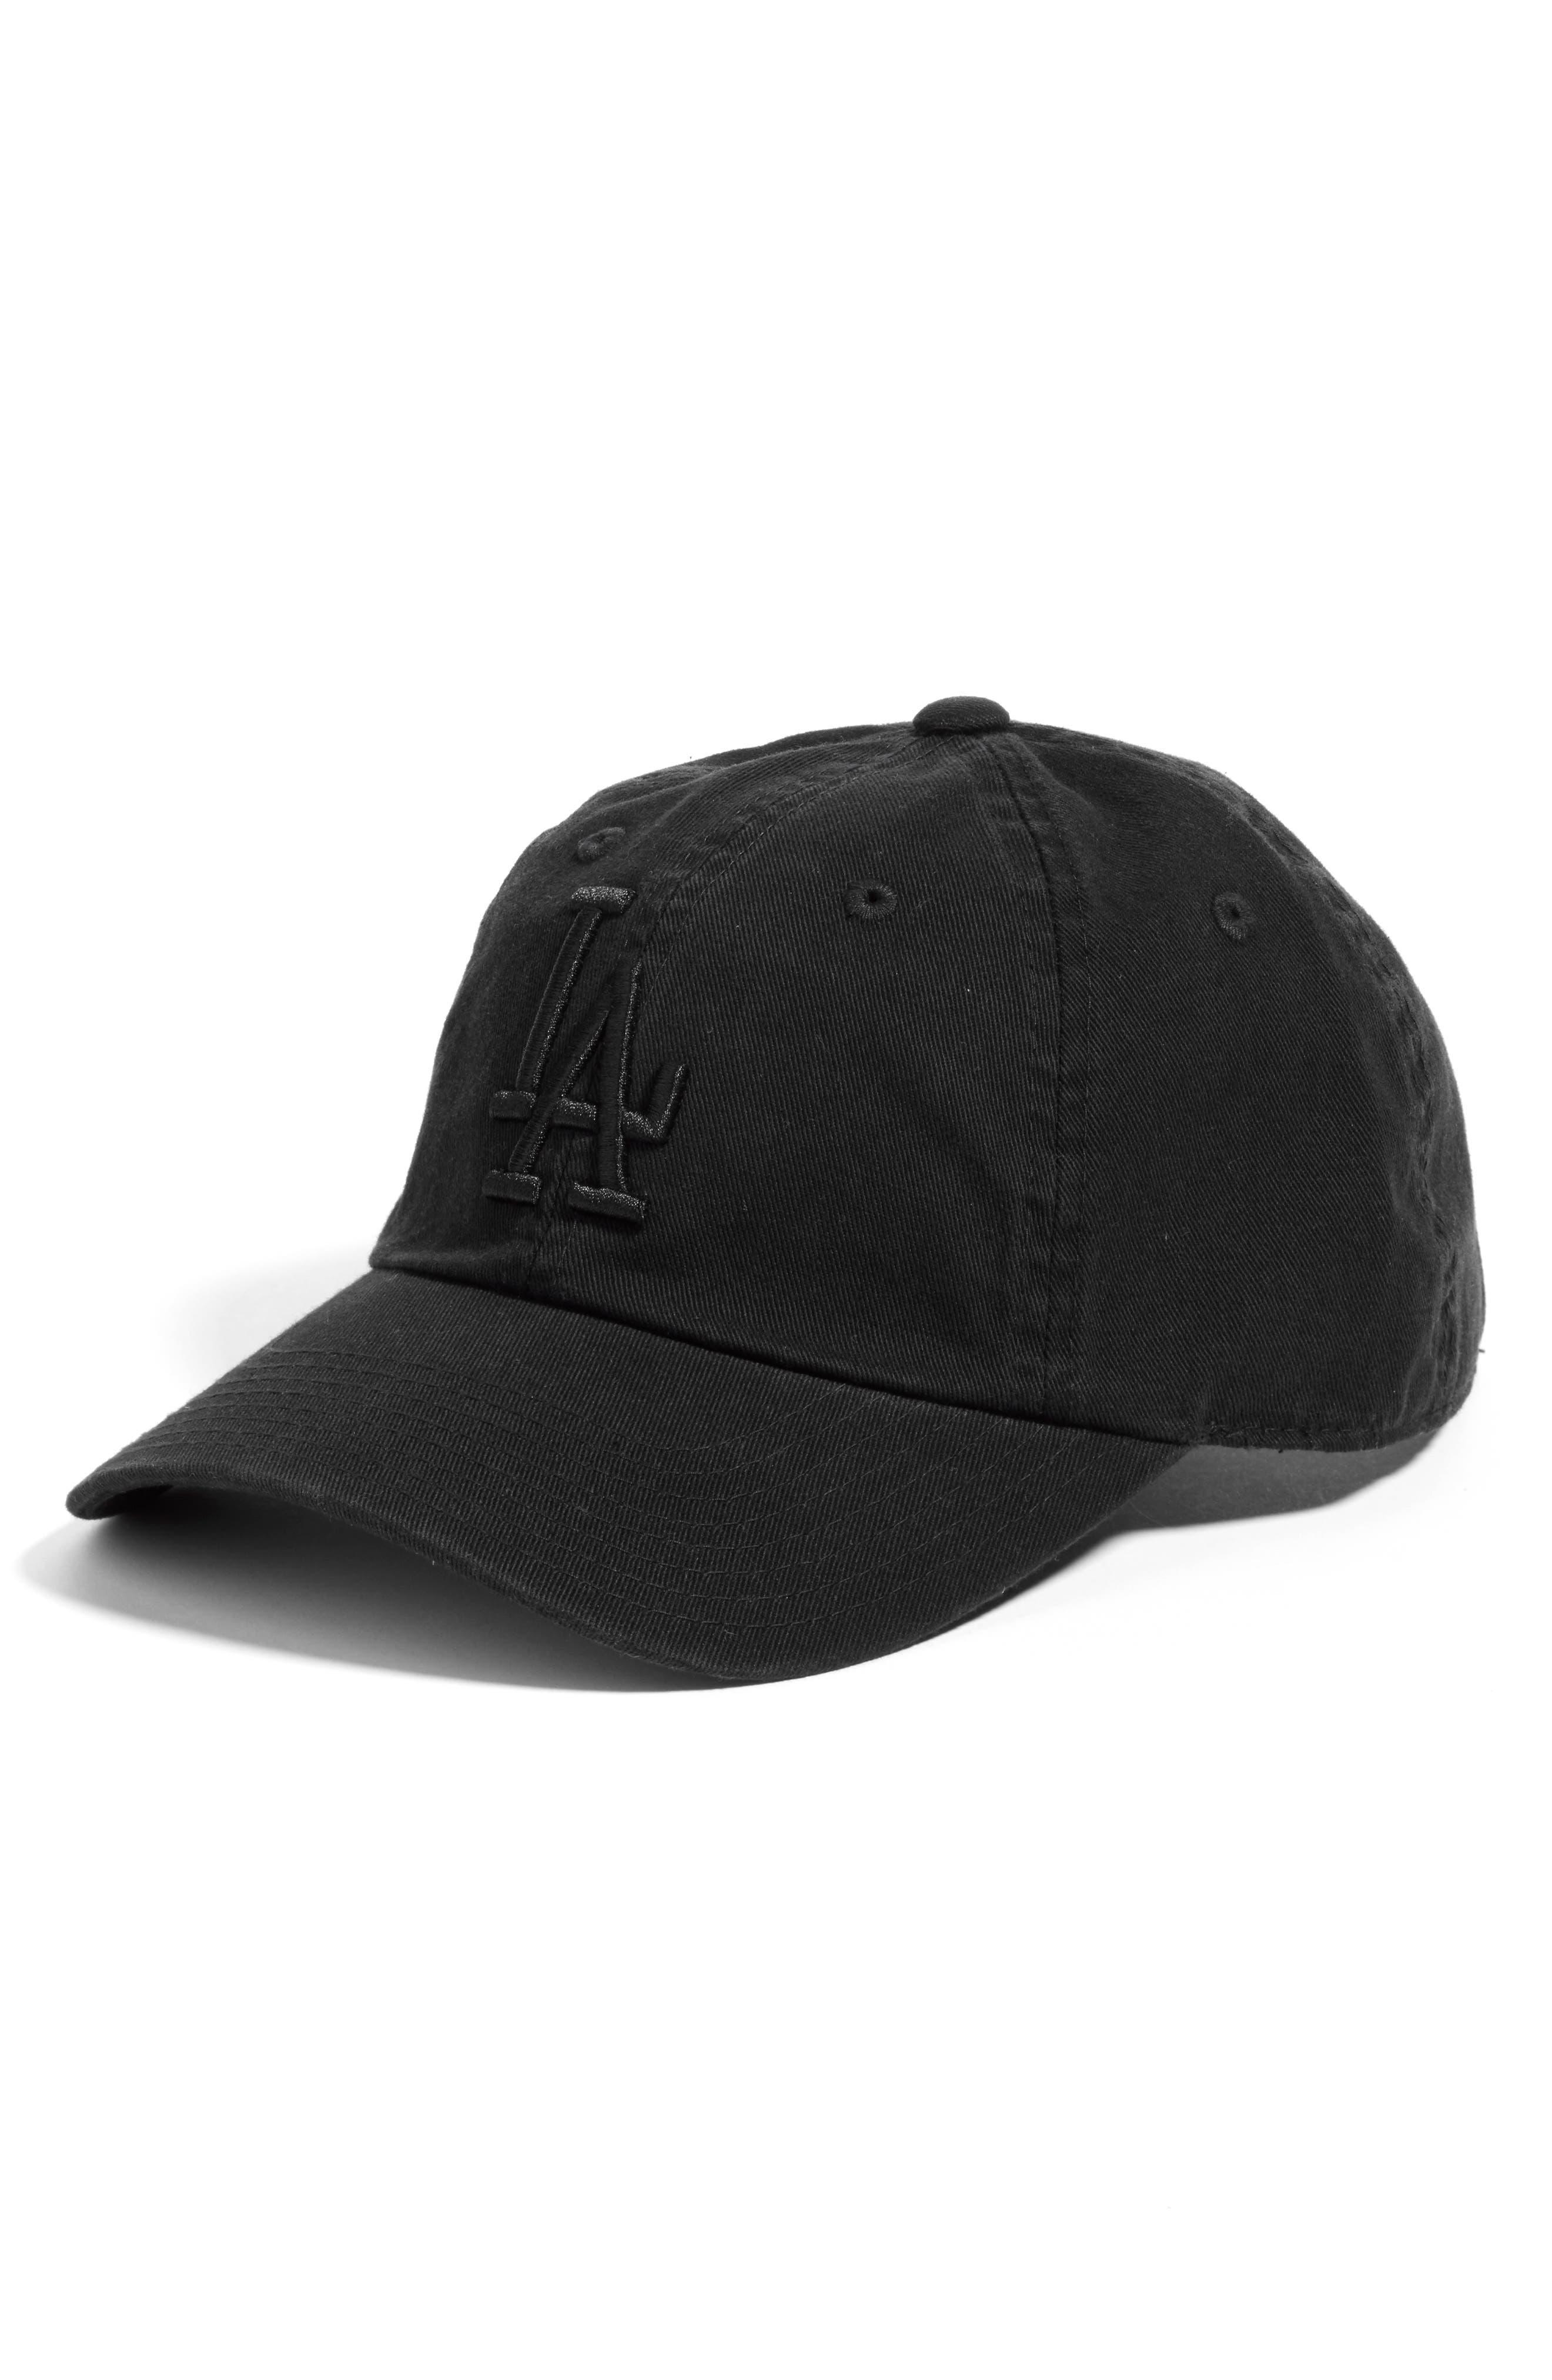 American Needle Ballpark - Los Angeles Dodgers Baseball Cap